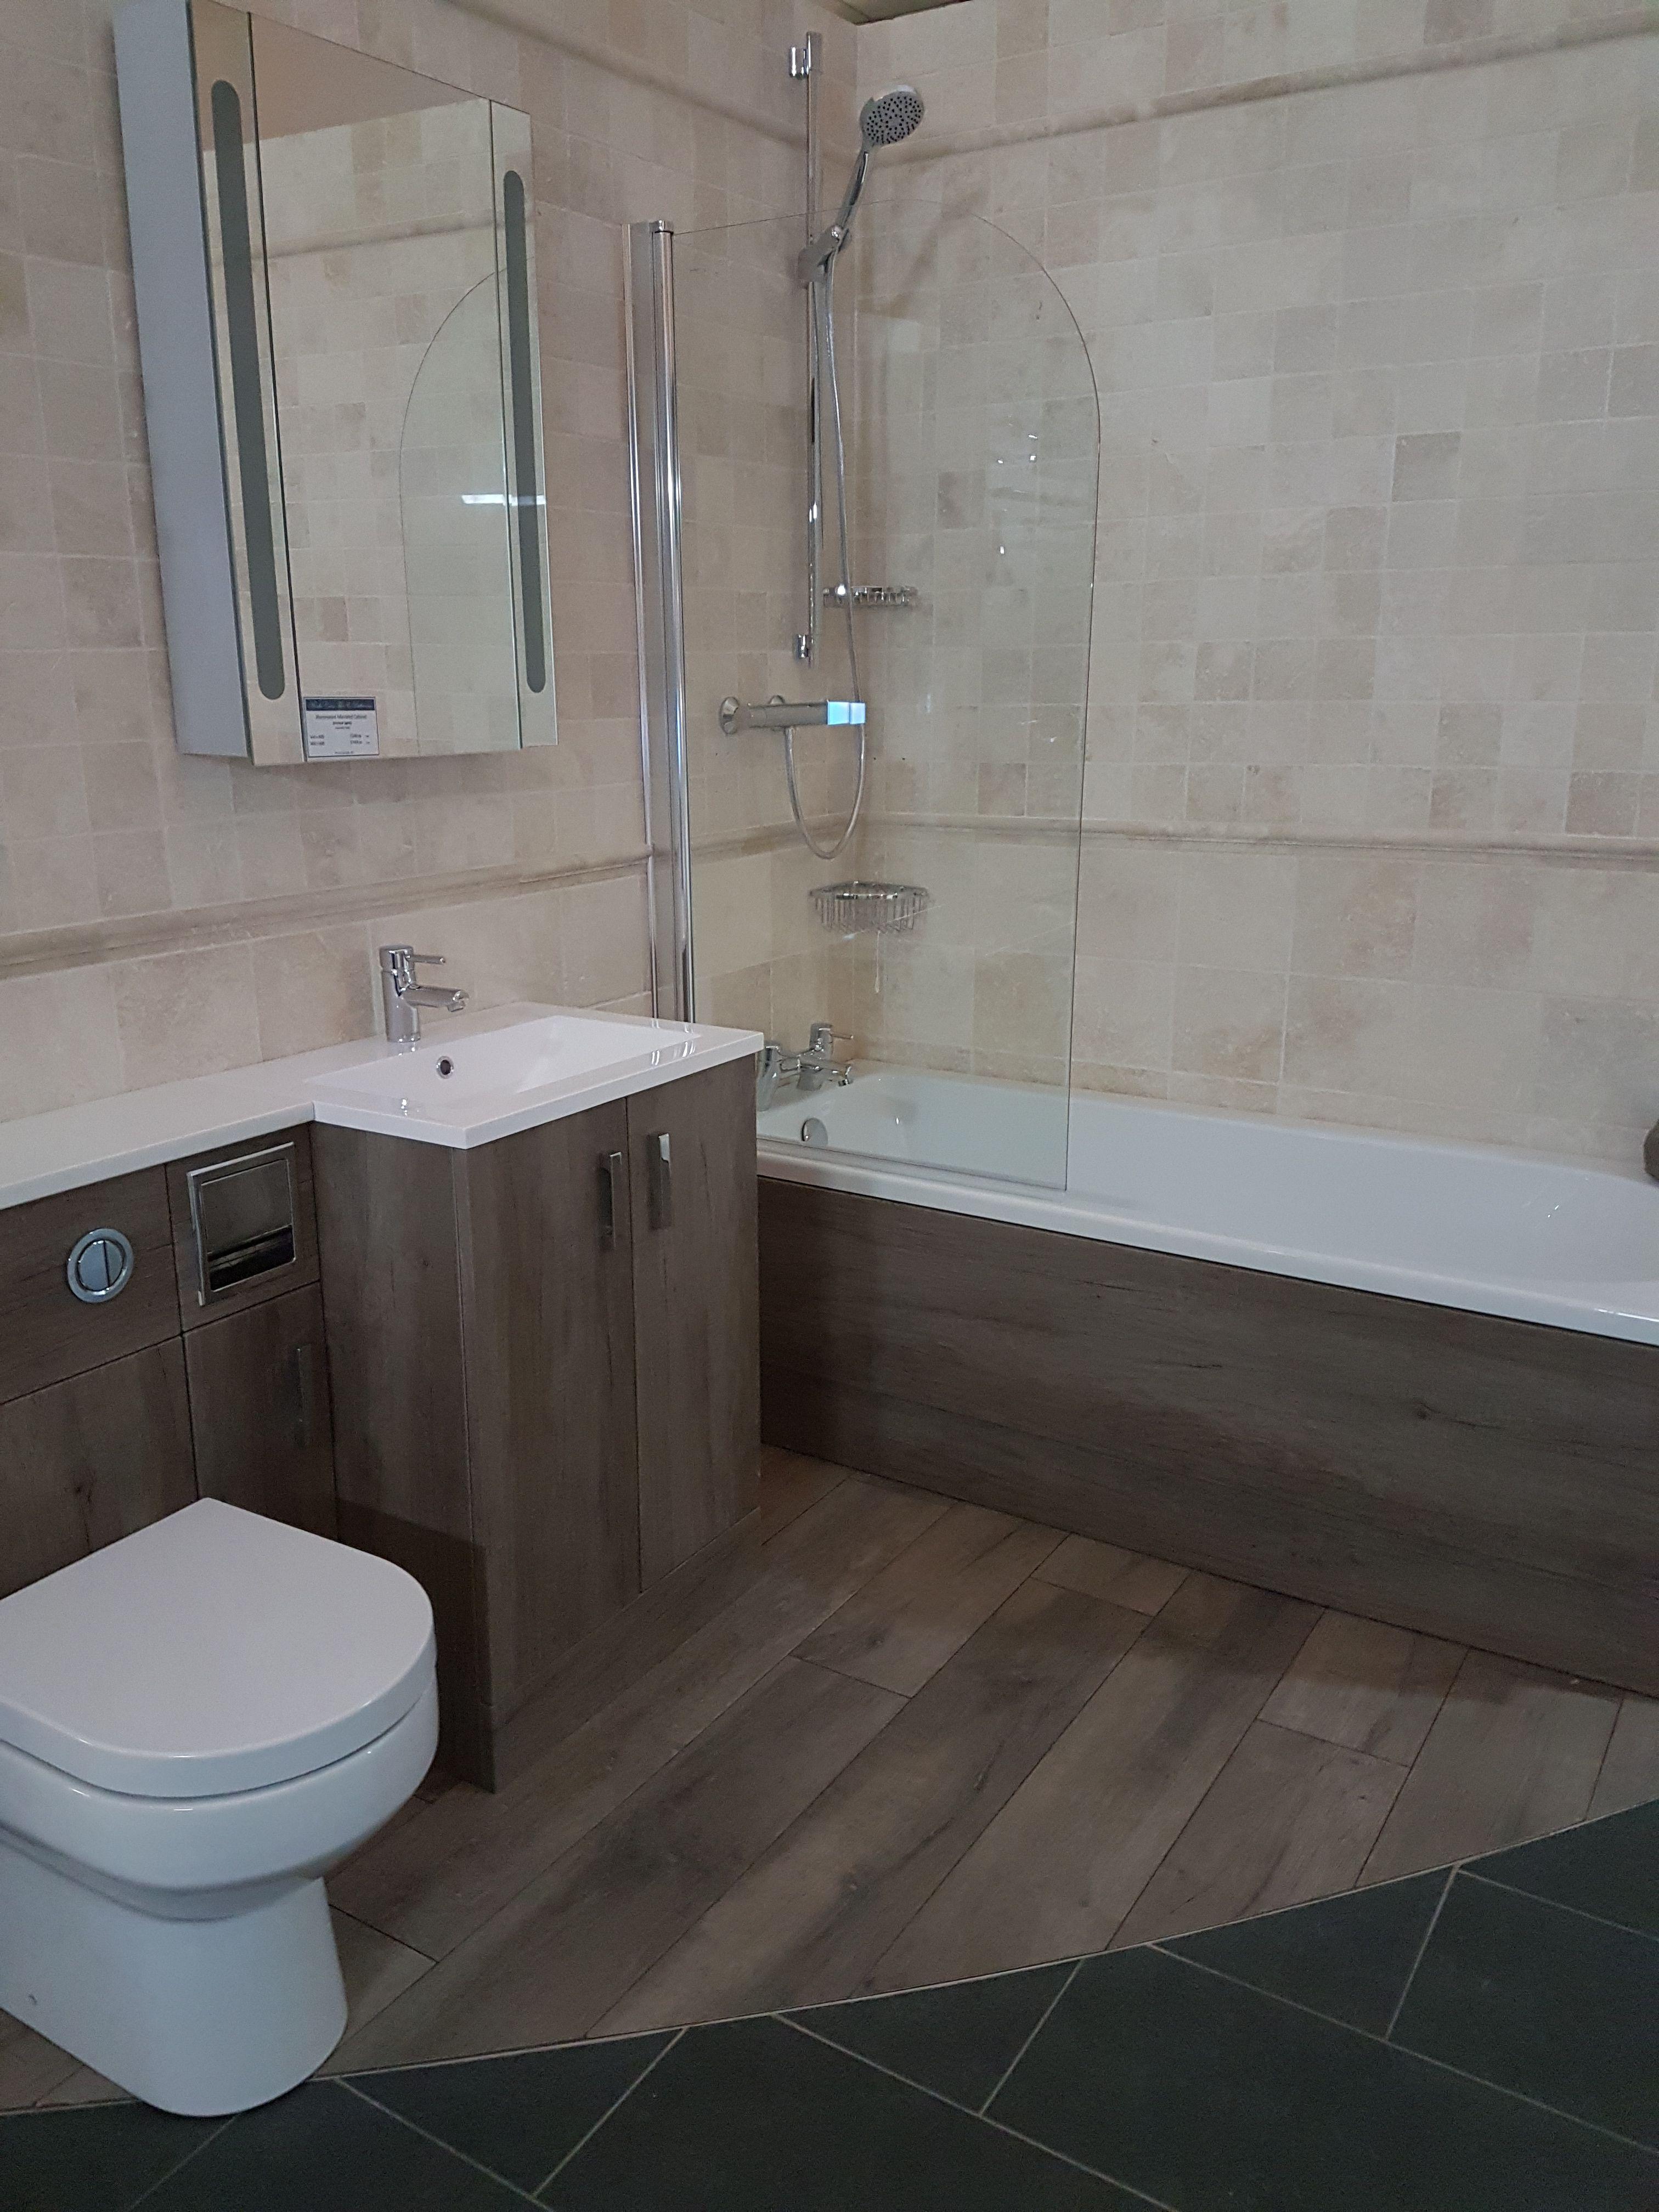 Bathroom And Tile Inspiration Showroom Displays Yorkshire Tile Bathroom Bathroom Showroom Display